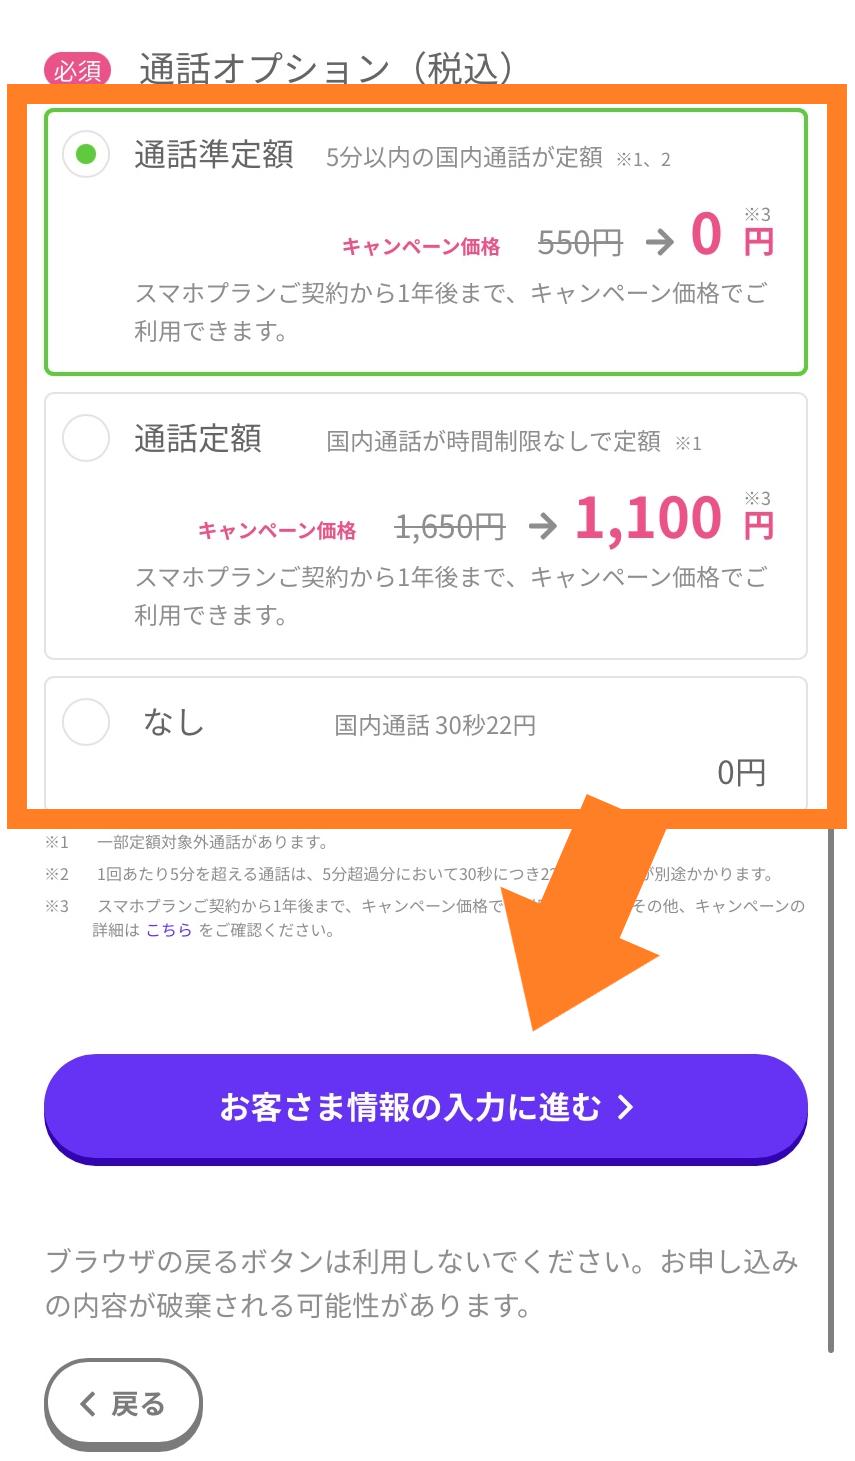 LINEMO_iPhone_LINEMO申し込み手続き7